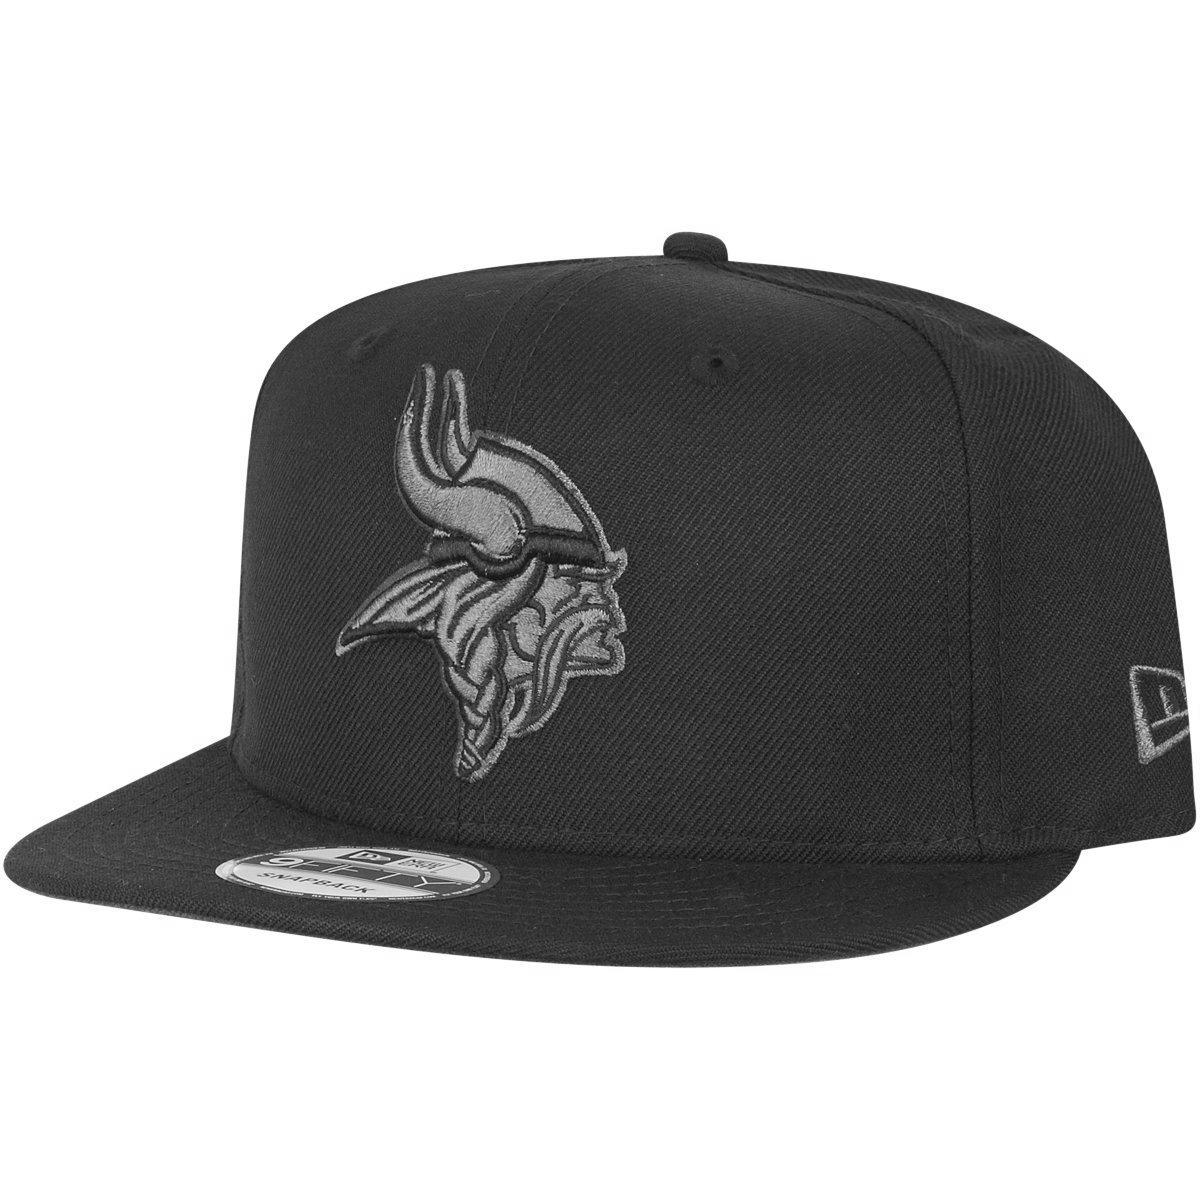 New Era 9Fifty Snapback Cap - Minnesota Vikings schwarz grau | eBay